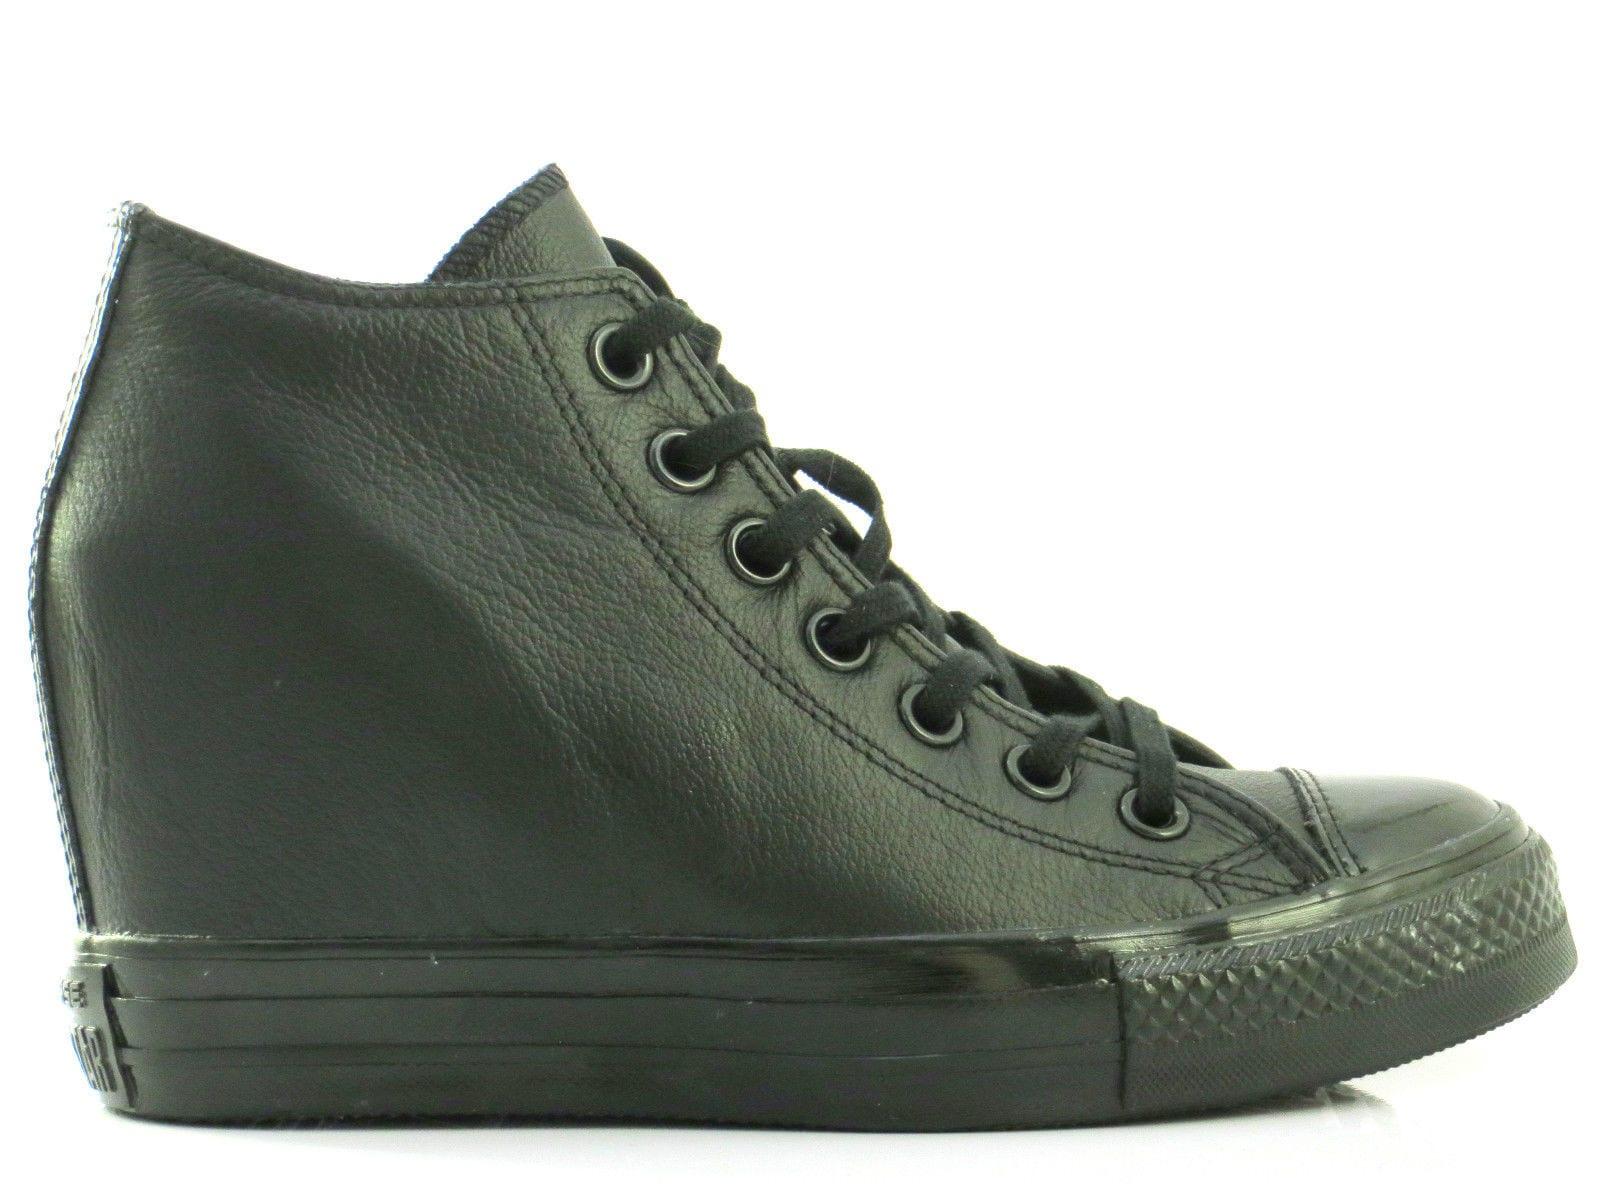 Converse : Chuck Taylor lux mid leather - Black/black